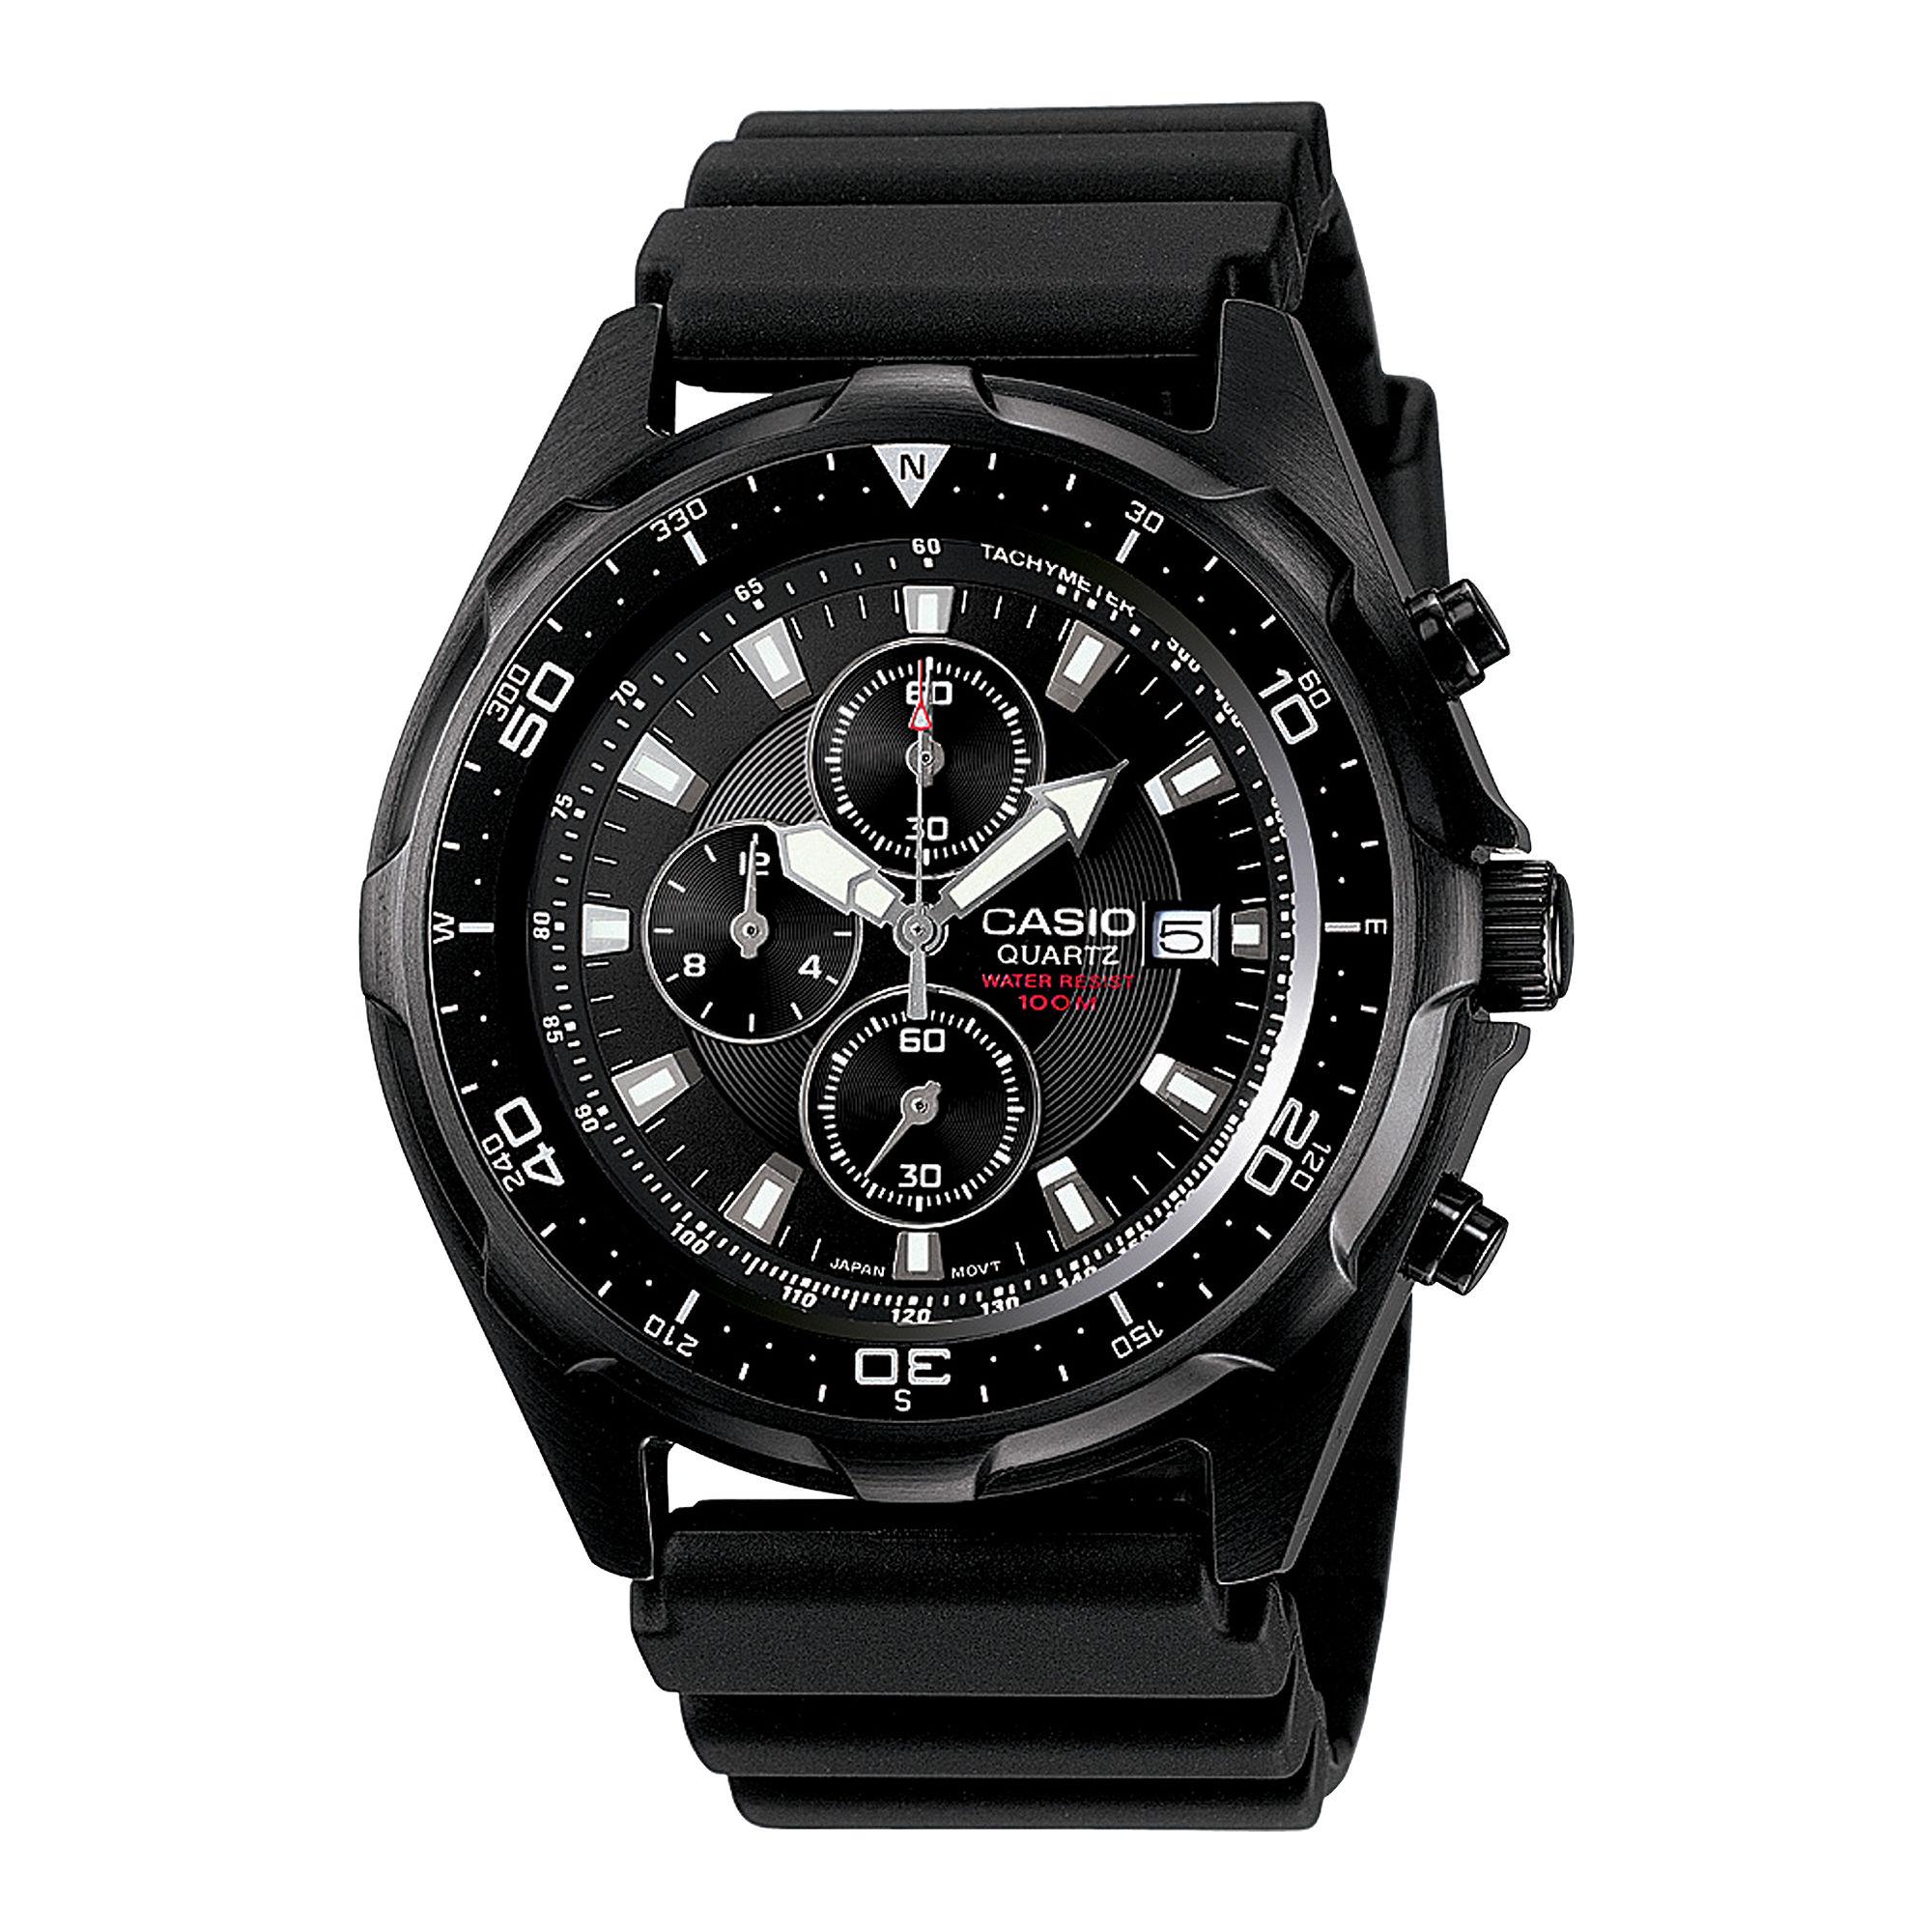 Casio Mens Black Chronograph Dive Watch AMW330B-1A